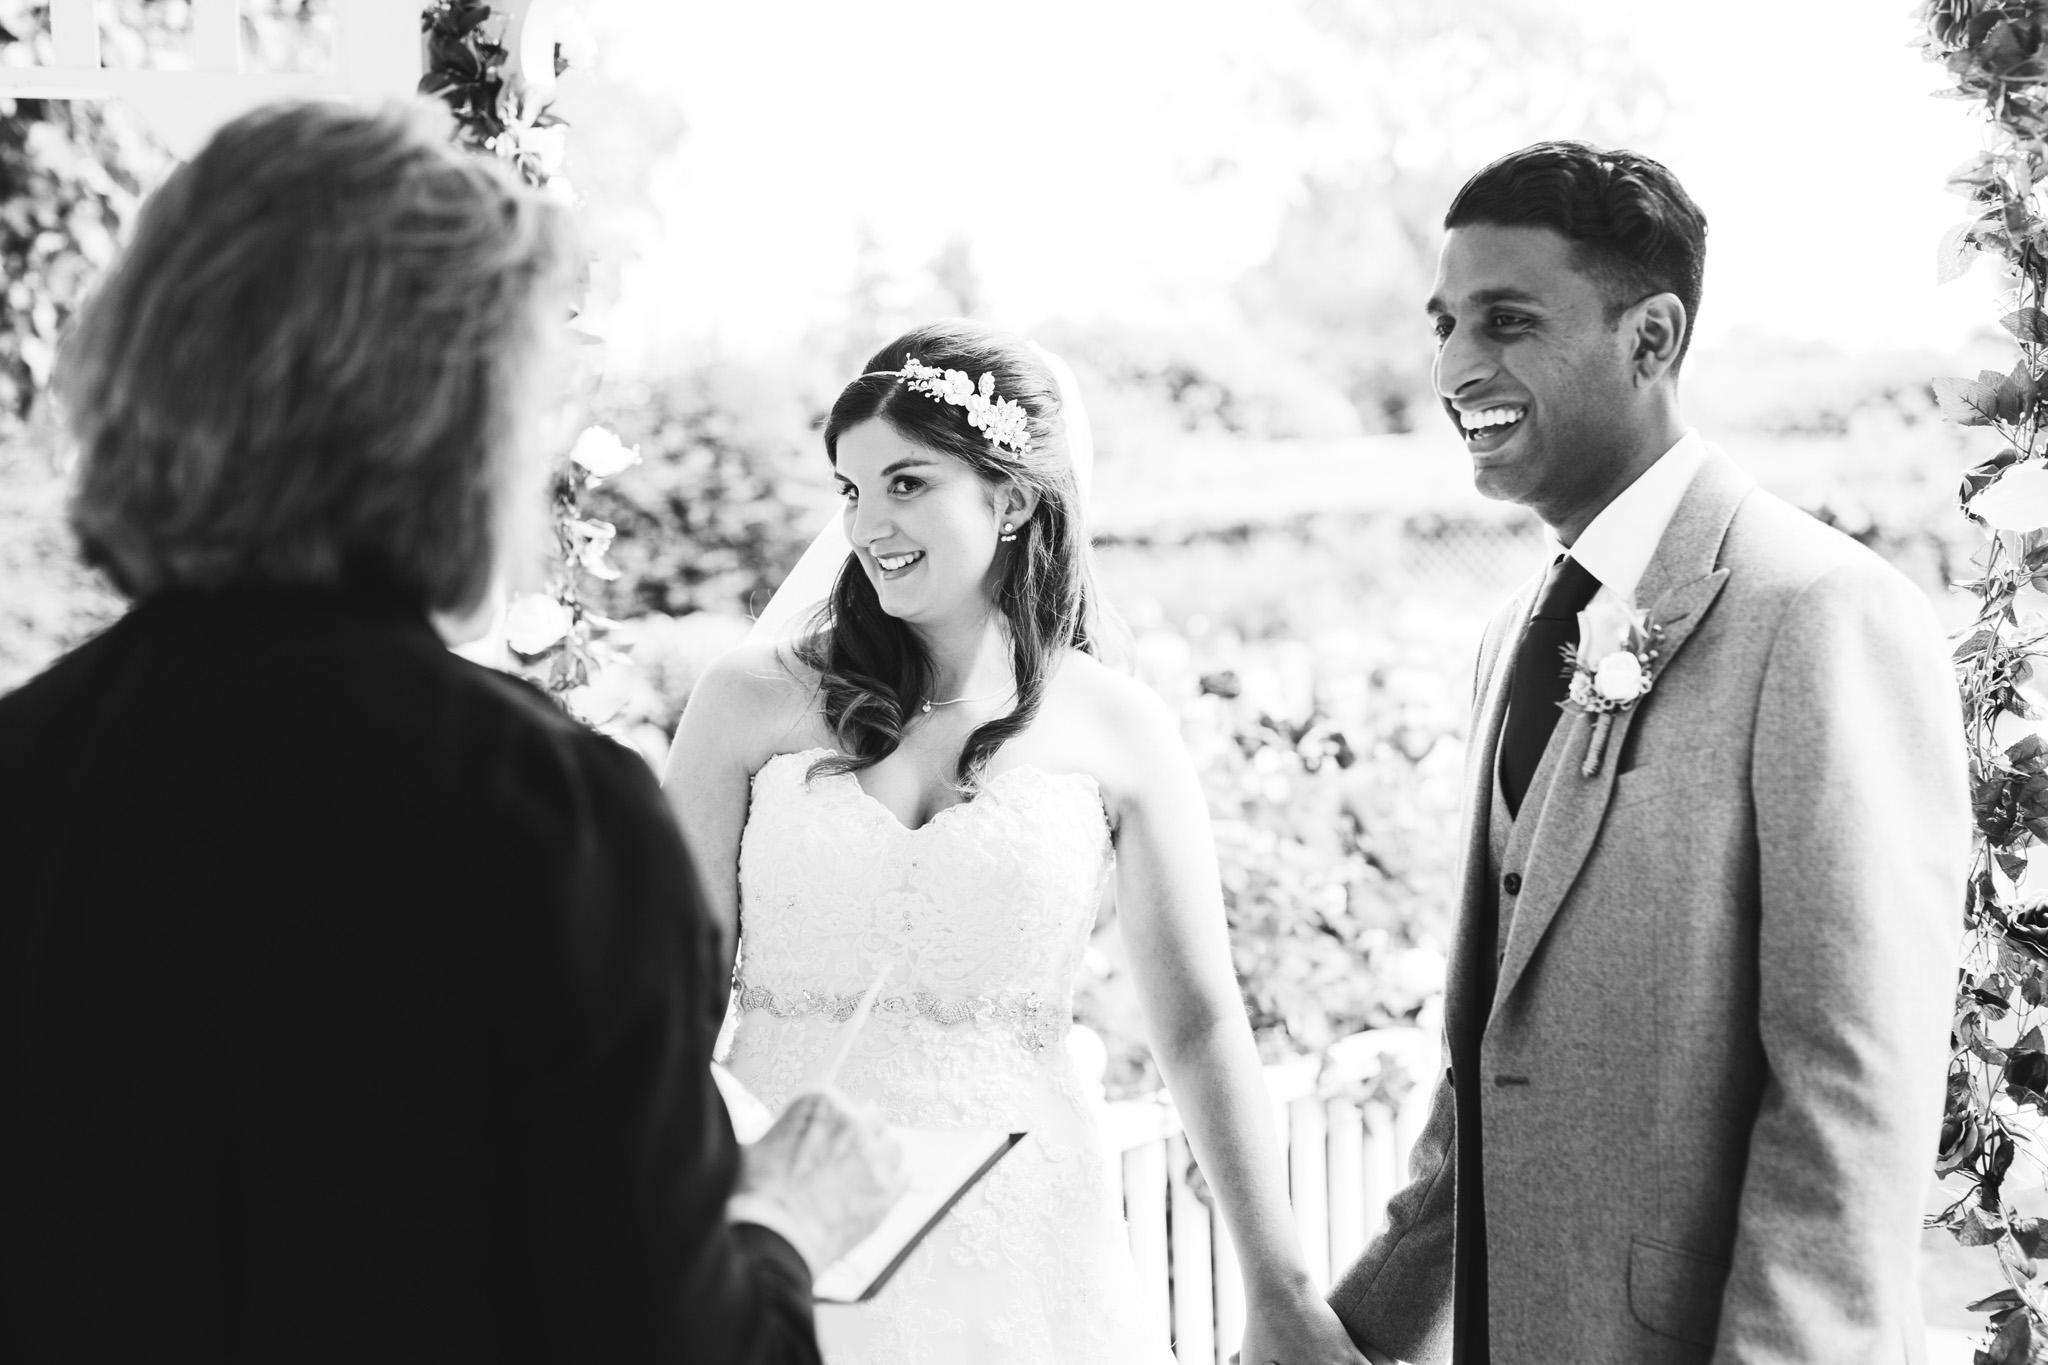 cat-lane-weddings__sheene-mill-wedding-photography__clw__1420__C5A9102.jpg